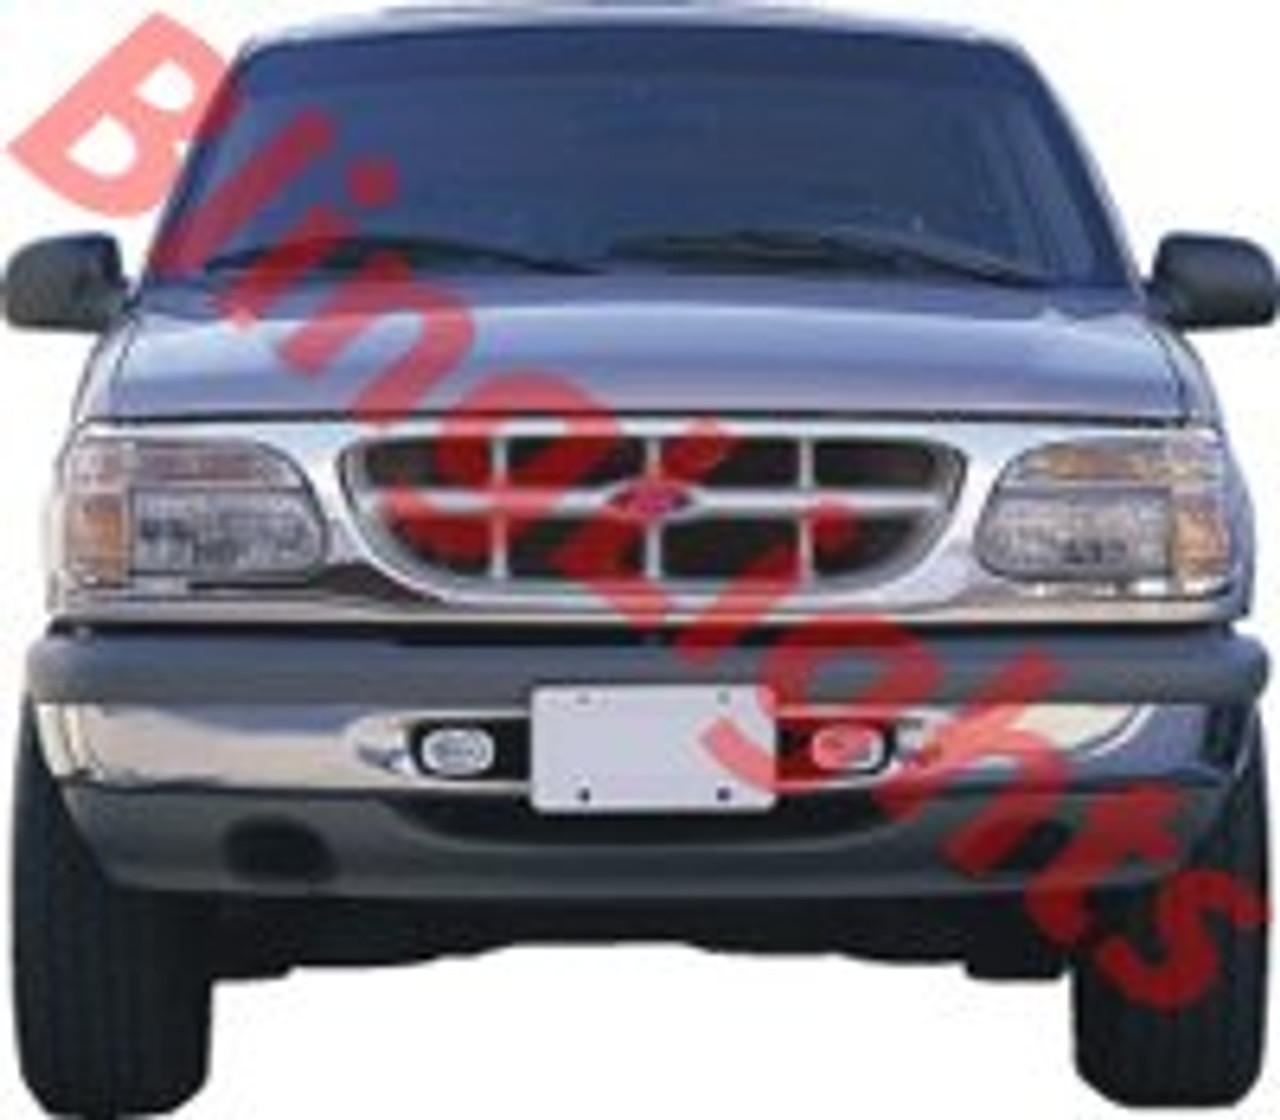 1995 1996 1997 1998 1999 Ford Explorer Drivinglights Driving Lamps Lights Kit